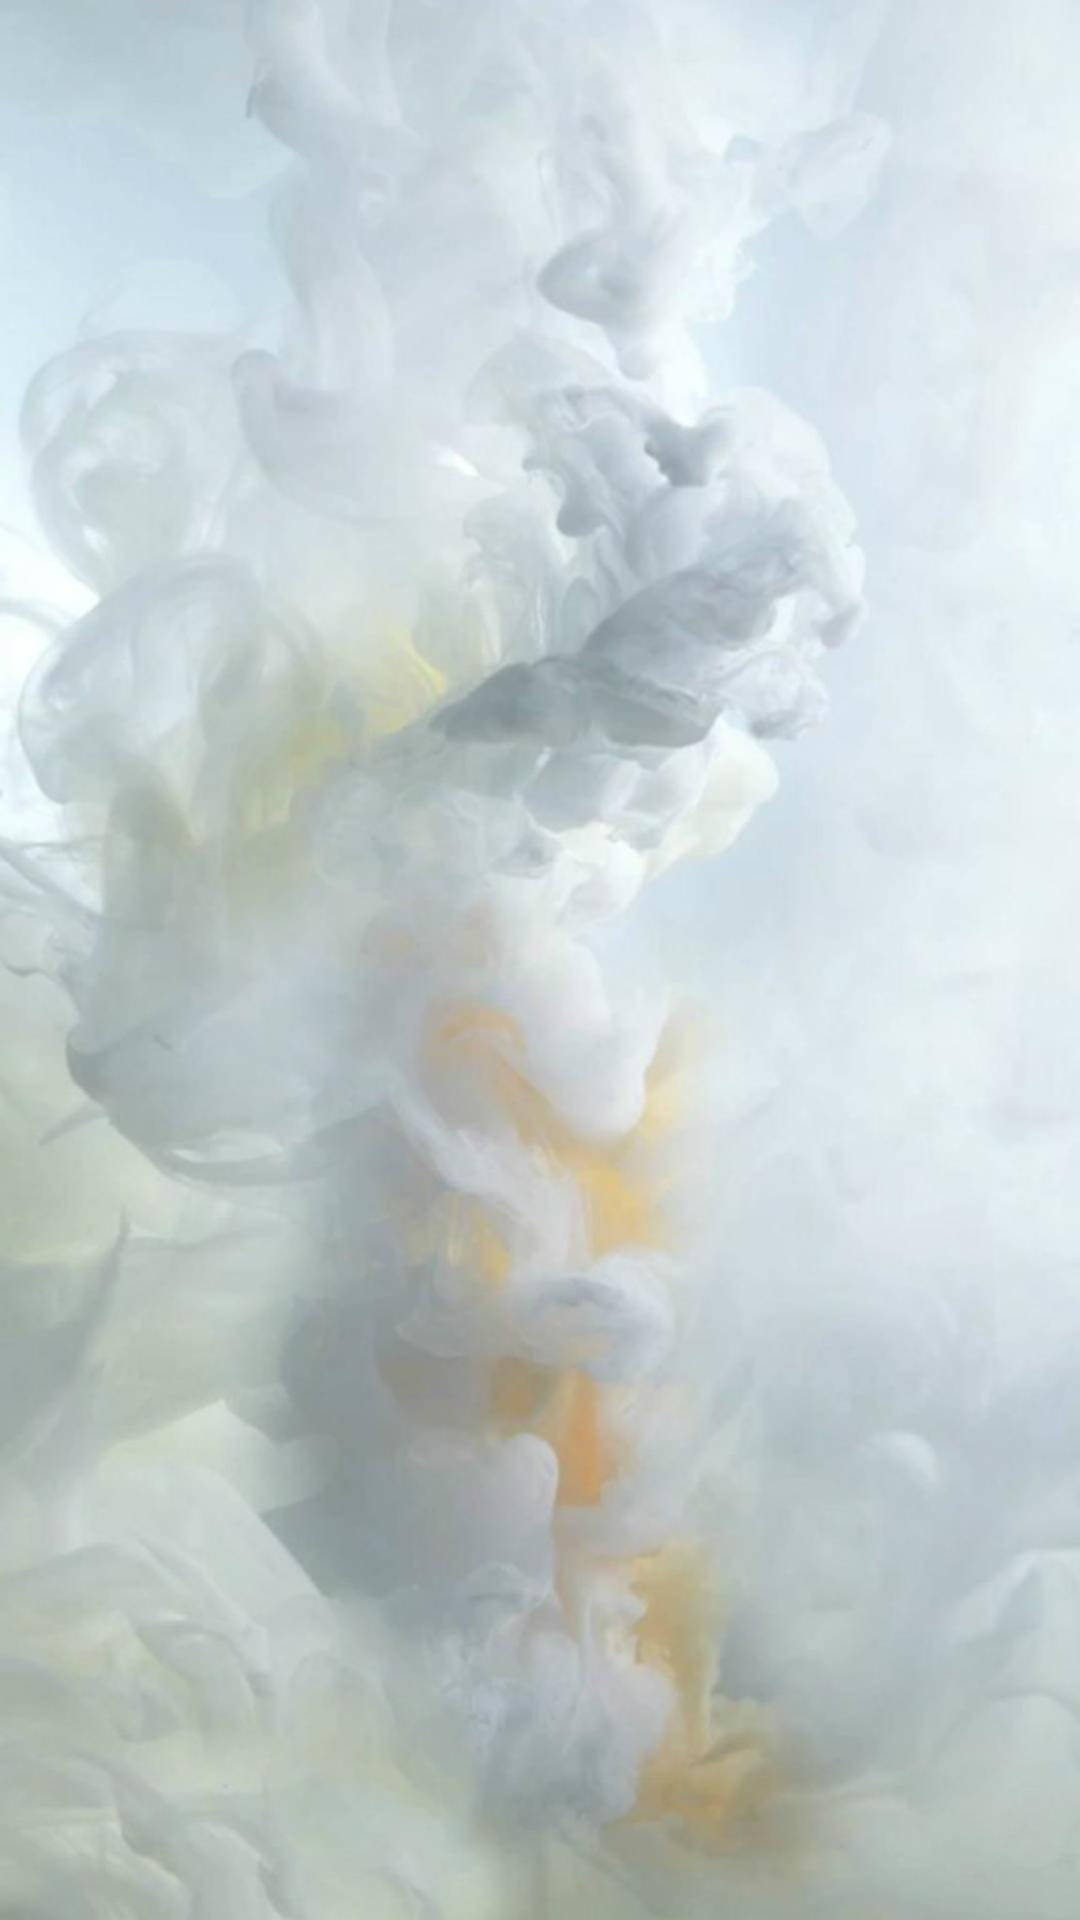 White-Ink-Smoke-iOS-Art-iPhone-wallpaper-wpc90010614